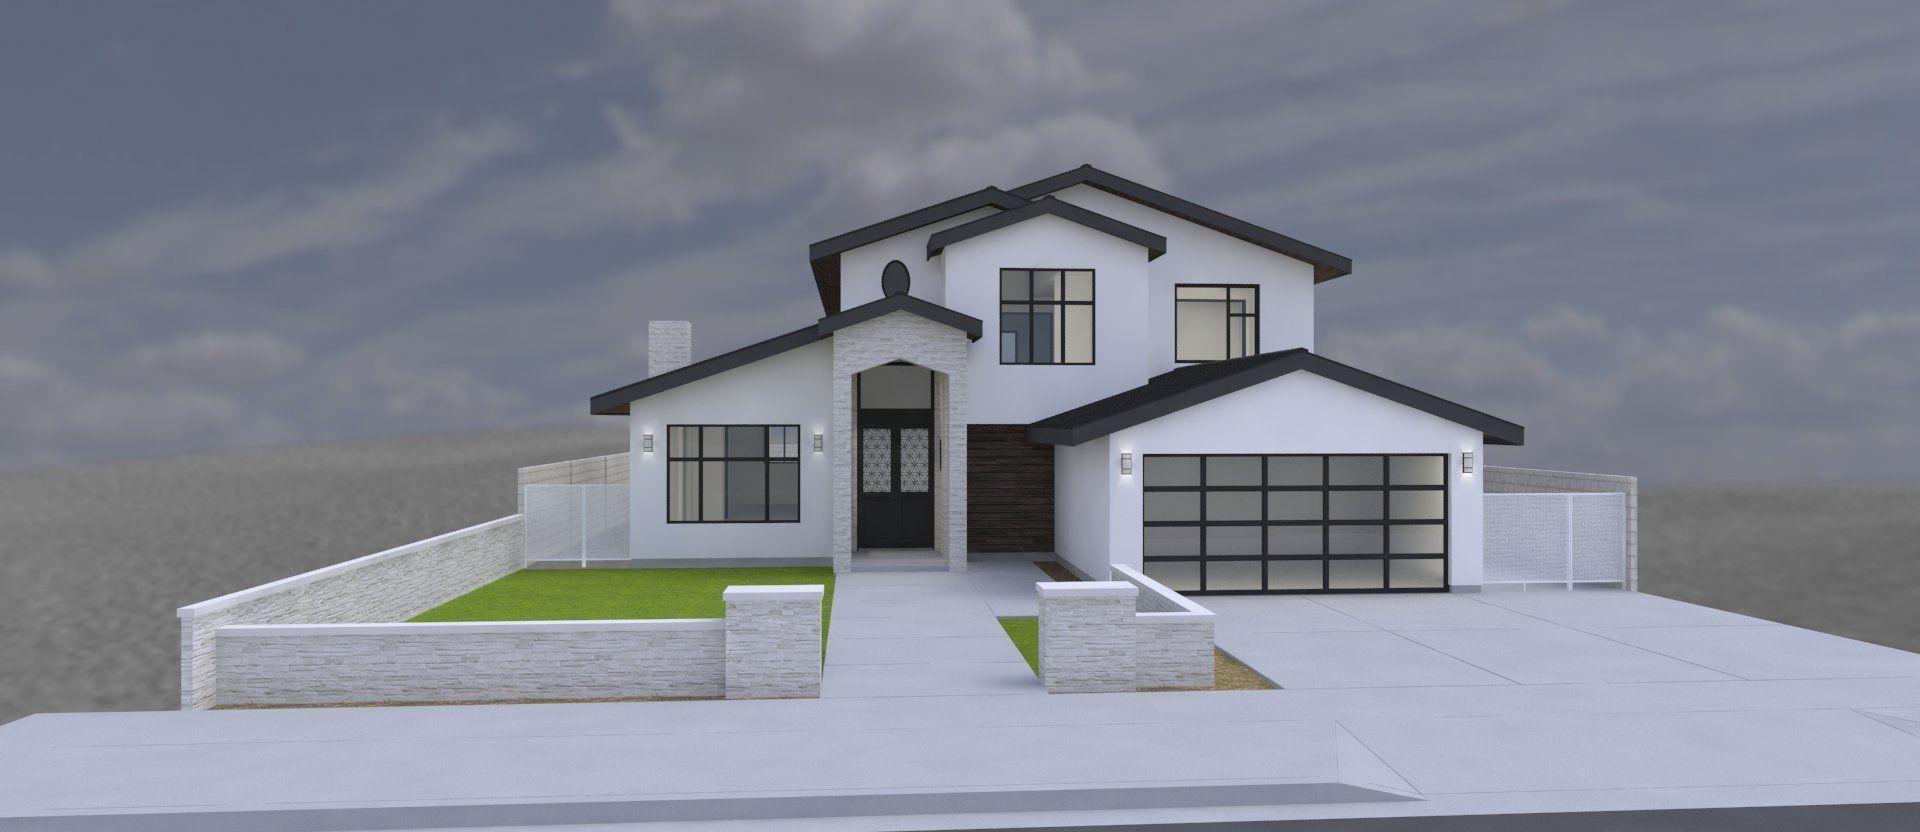 Modern house 2 story 4 bedrooms 2 car garage residential 3d model